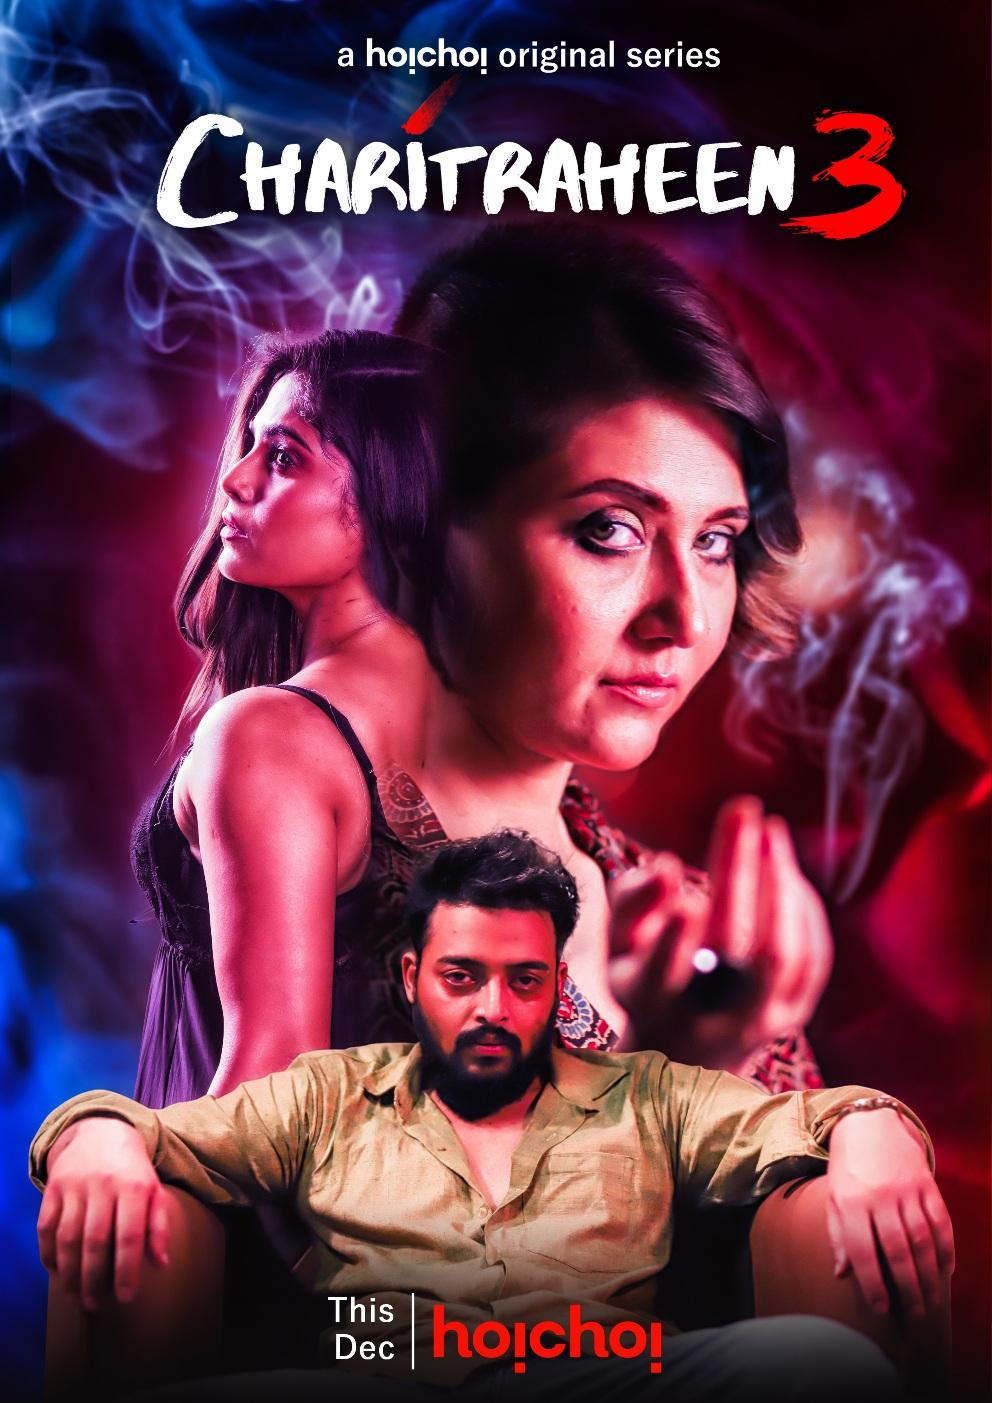 Charitraheen 3 (2020) S03 Hindi Hoichoi Full Complete Web Series 720p HDRip x264 Esub